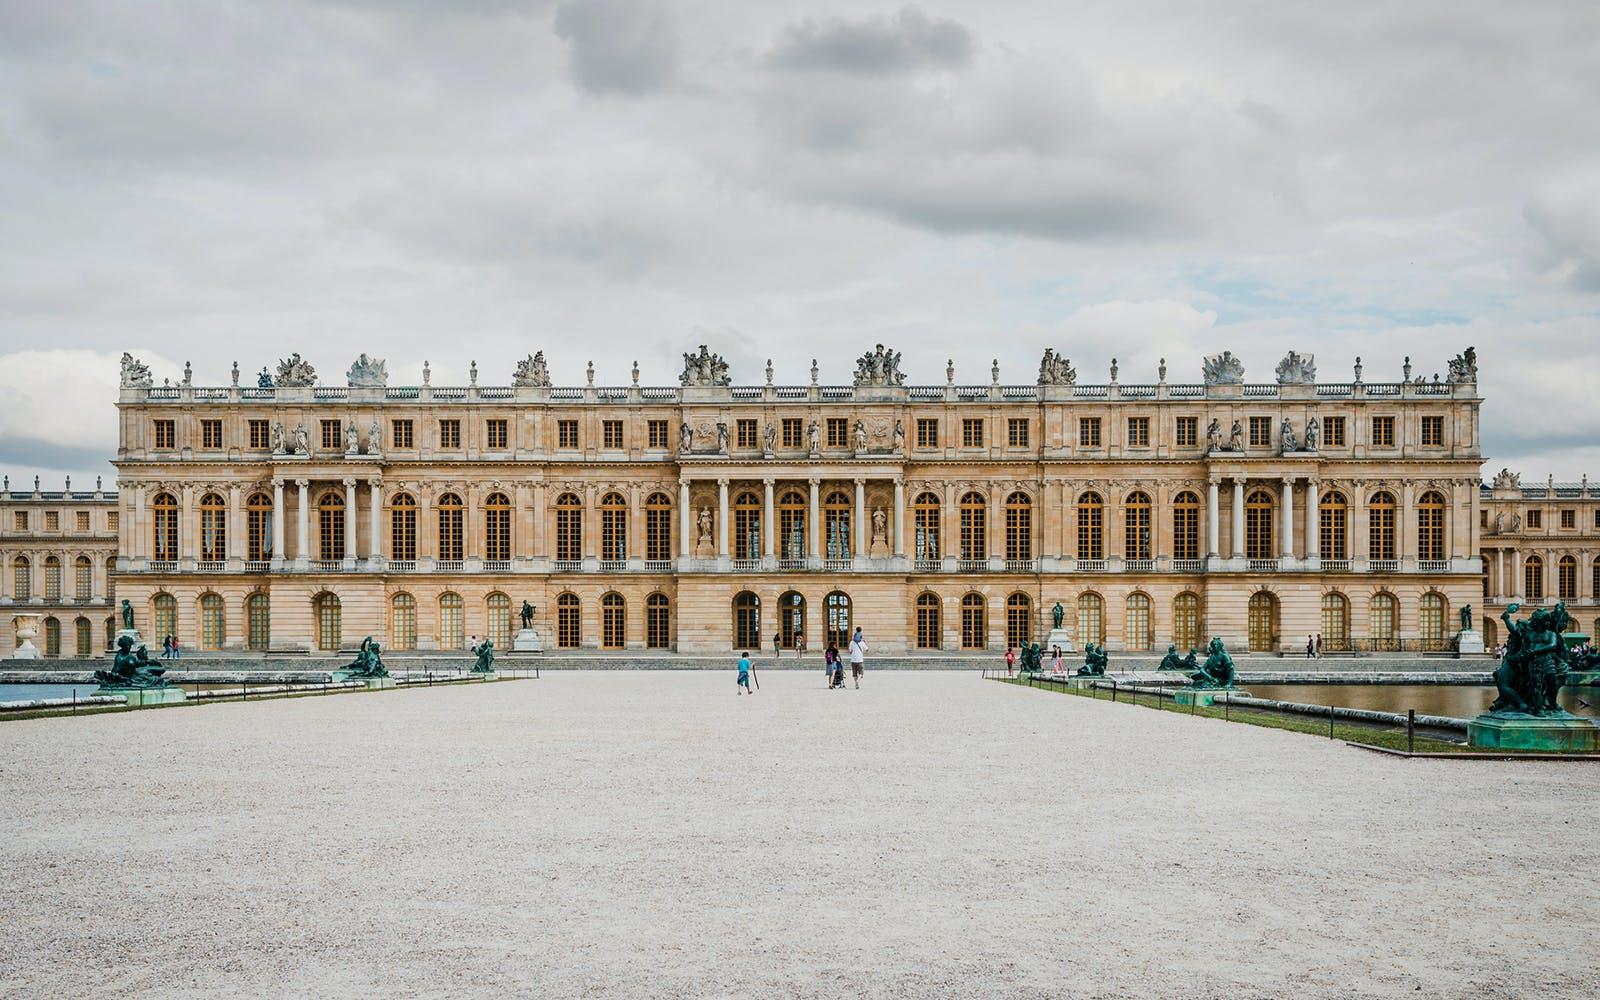 paris in november - palace of versailles